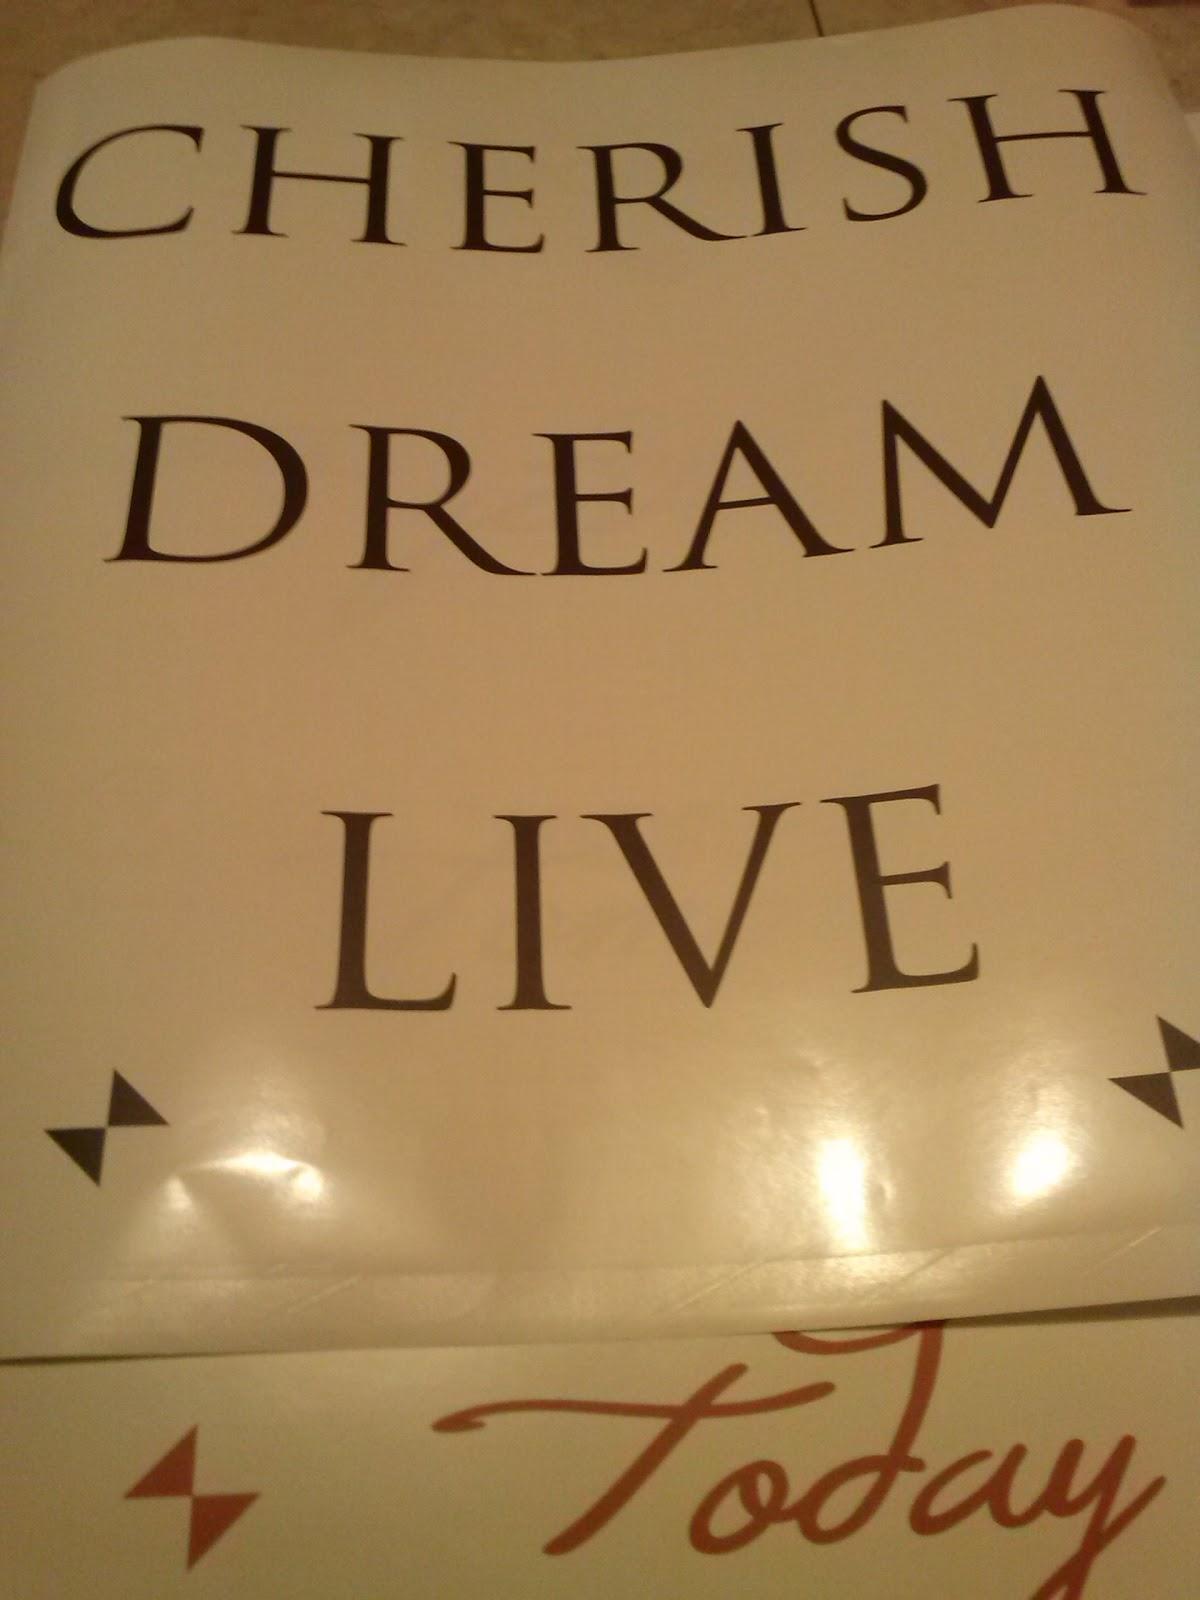 Cherish, Dream, Live vinyl wall decal